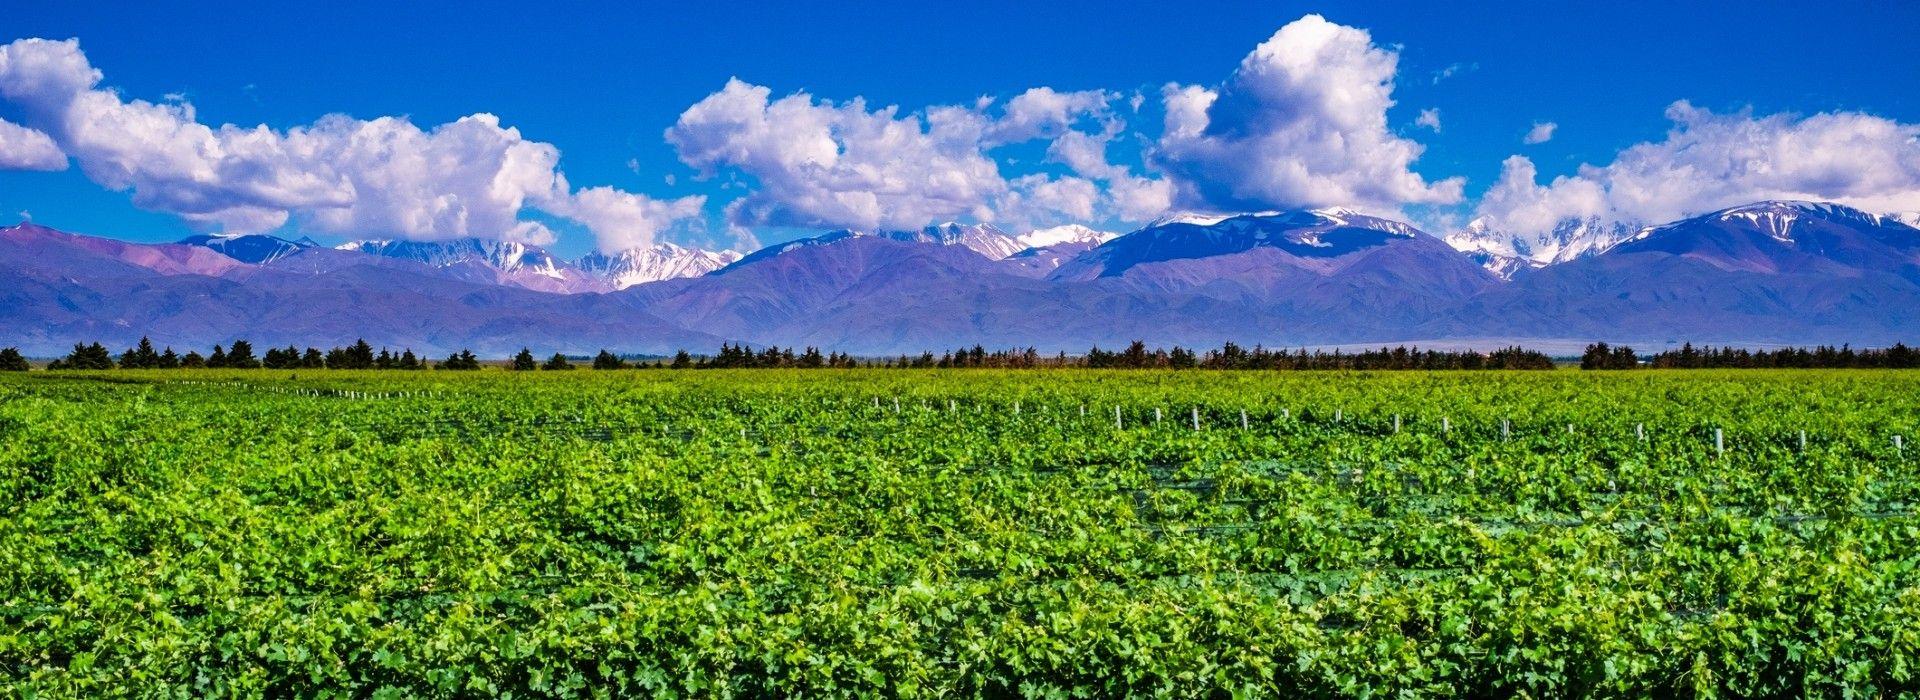 Mendoza Tours and Holidays 2019/2020